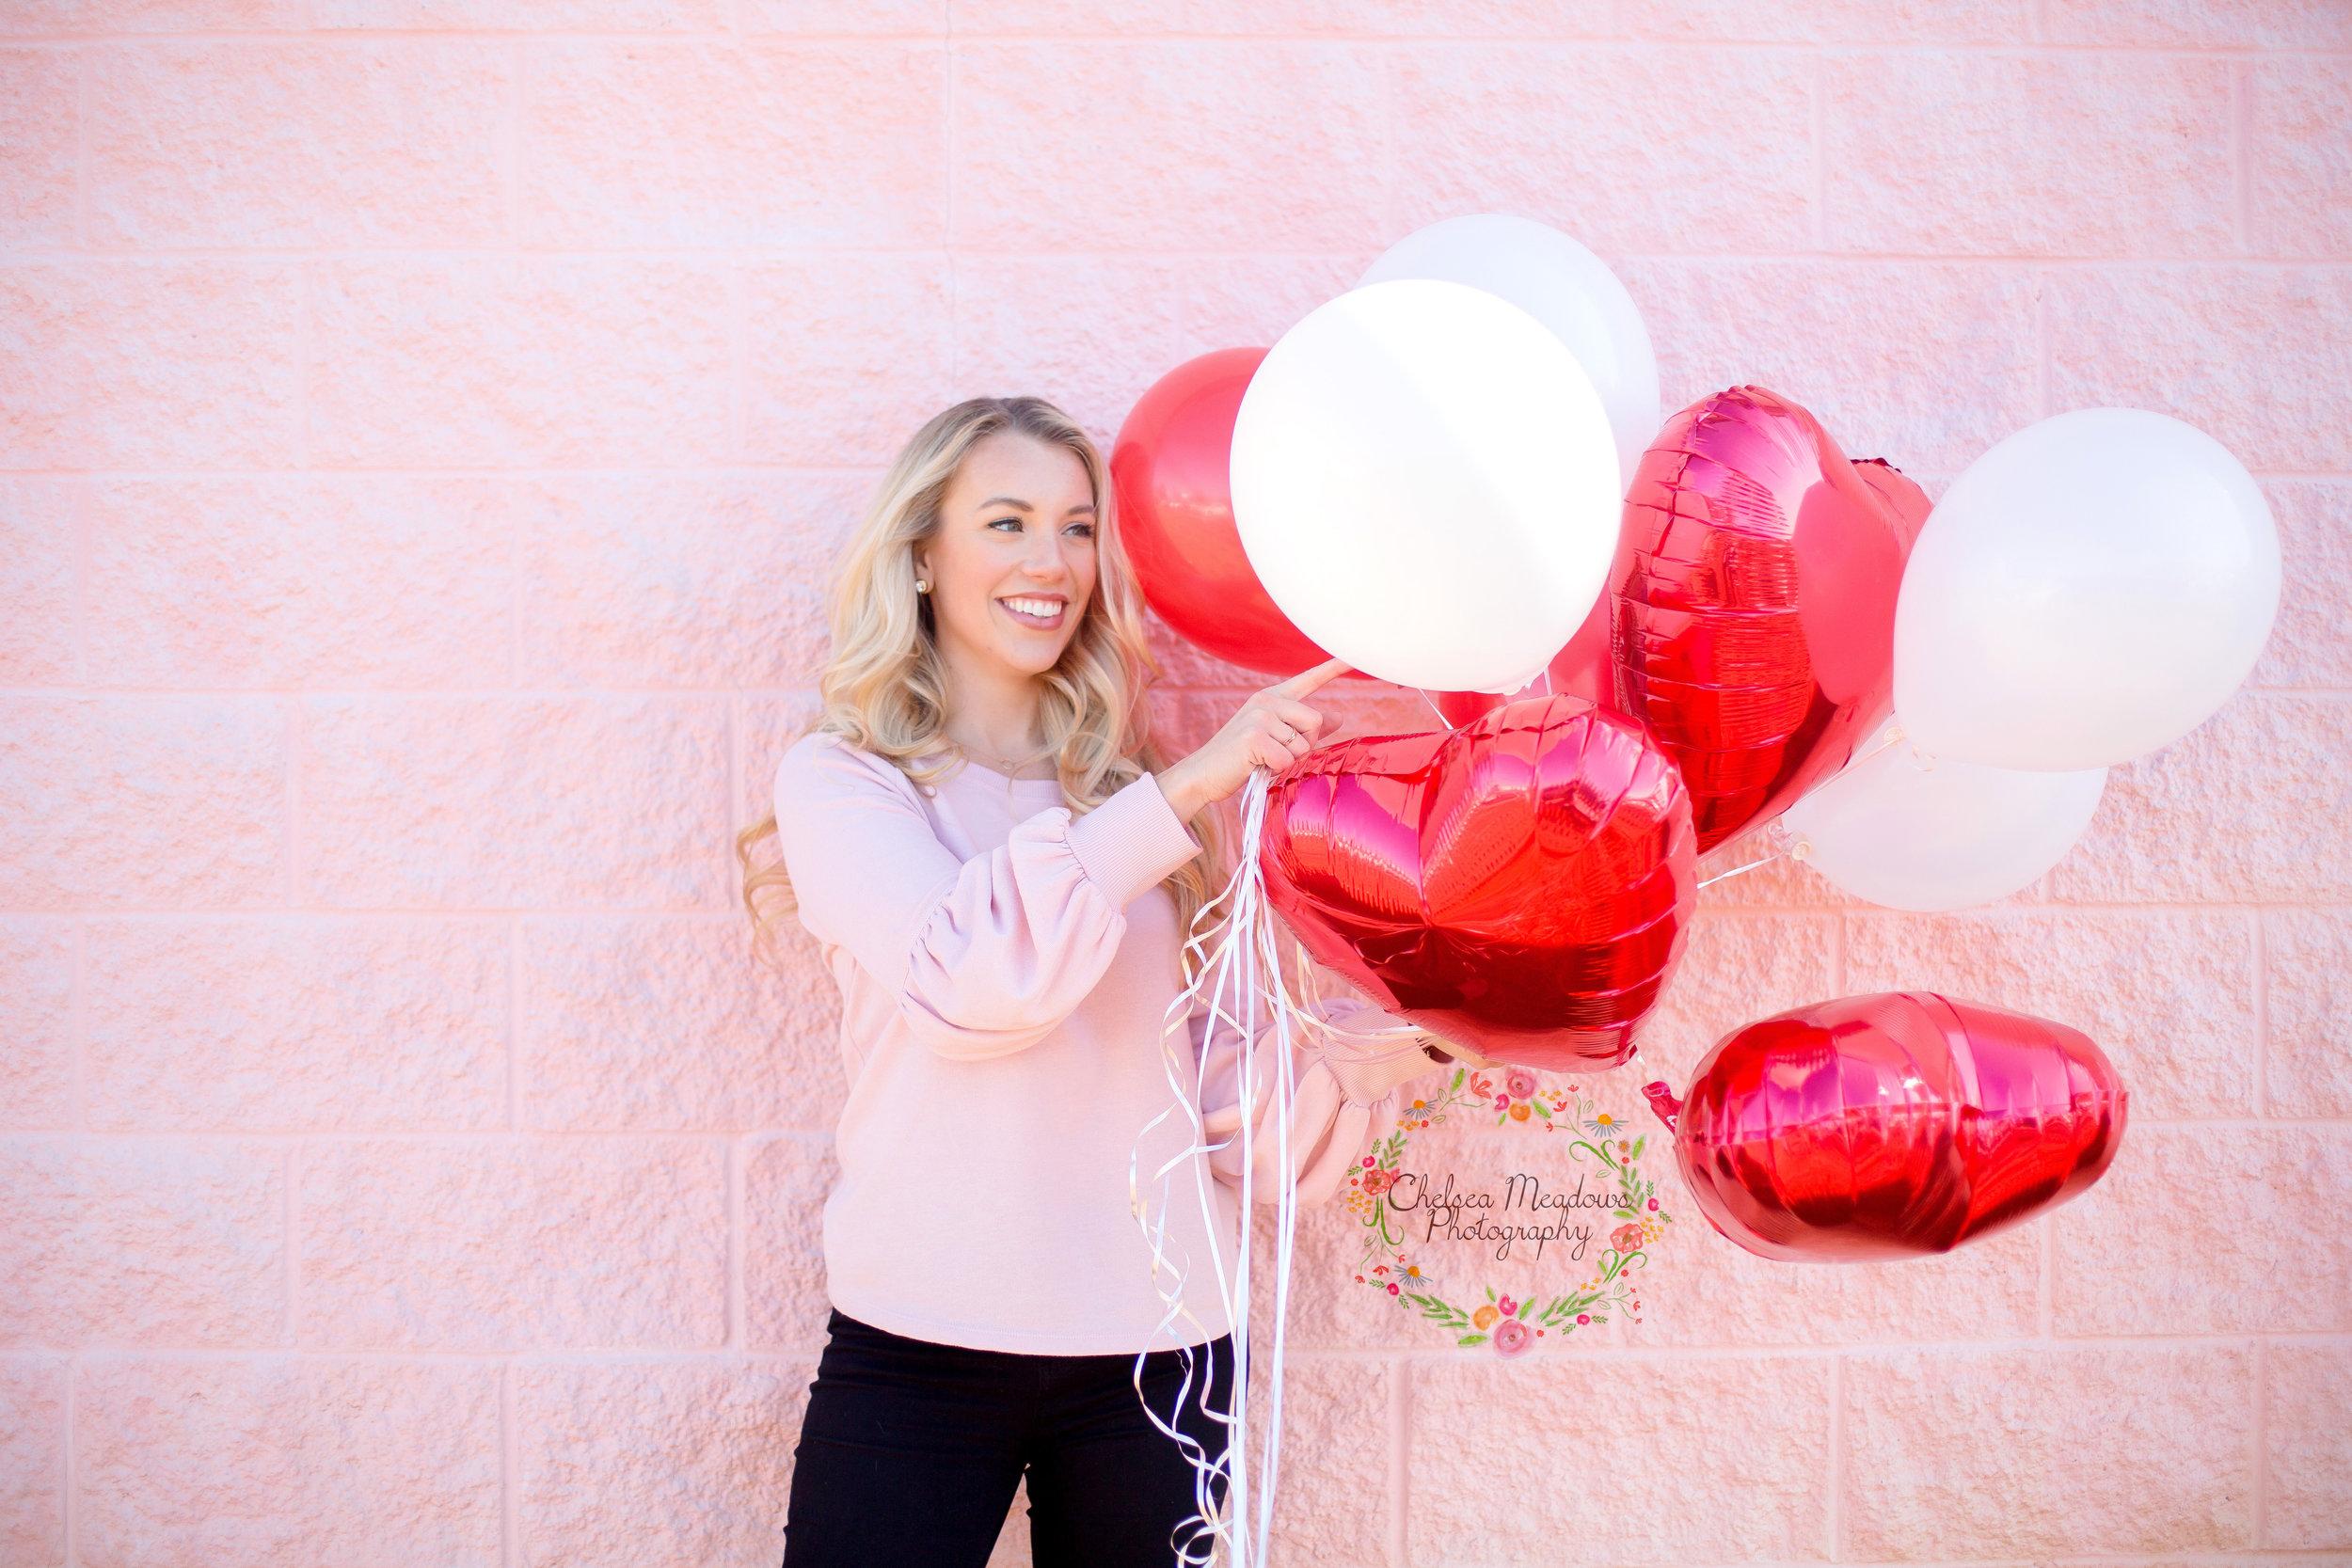 Lauren Cummings - Nashville Beauty Blogger - Chelsea Meadows Photography (69)_edited-1.jpg